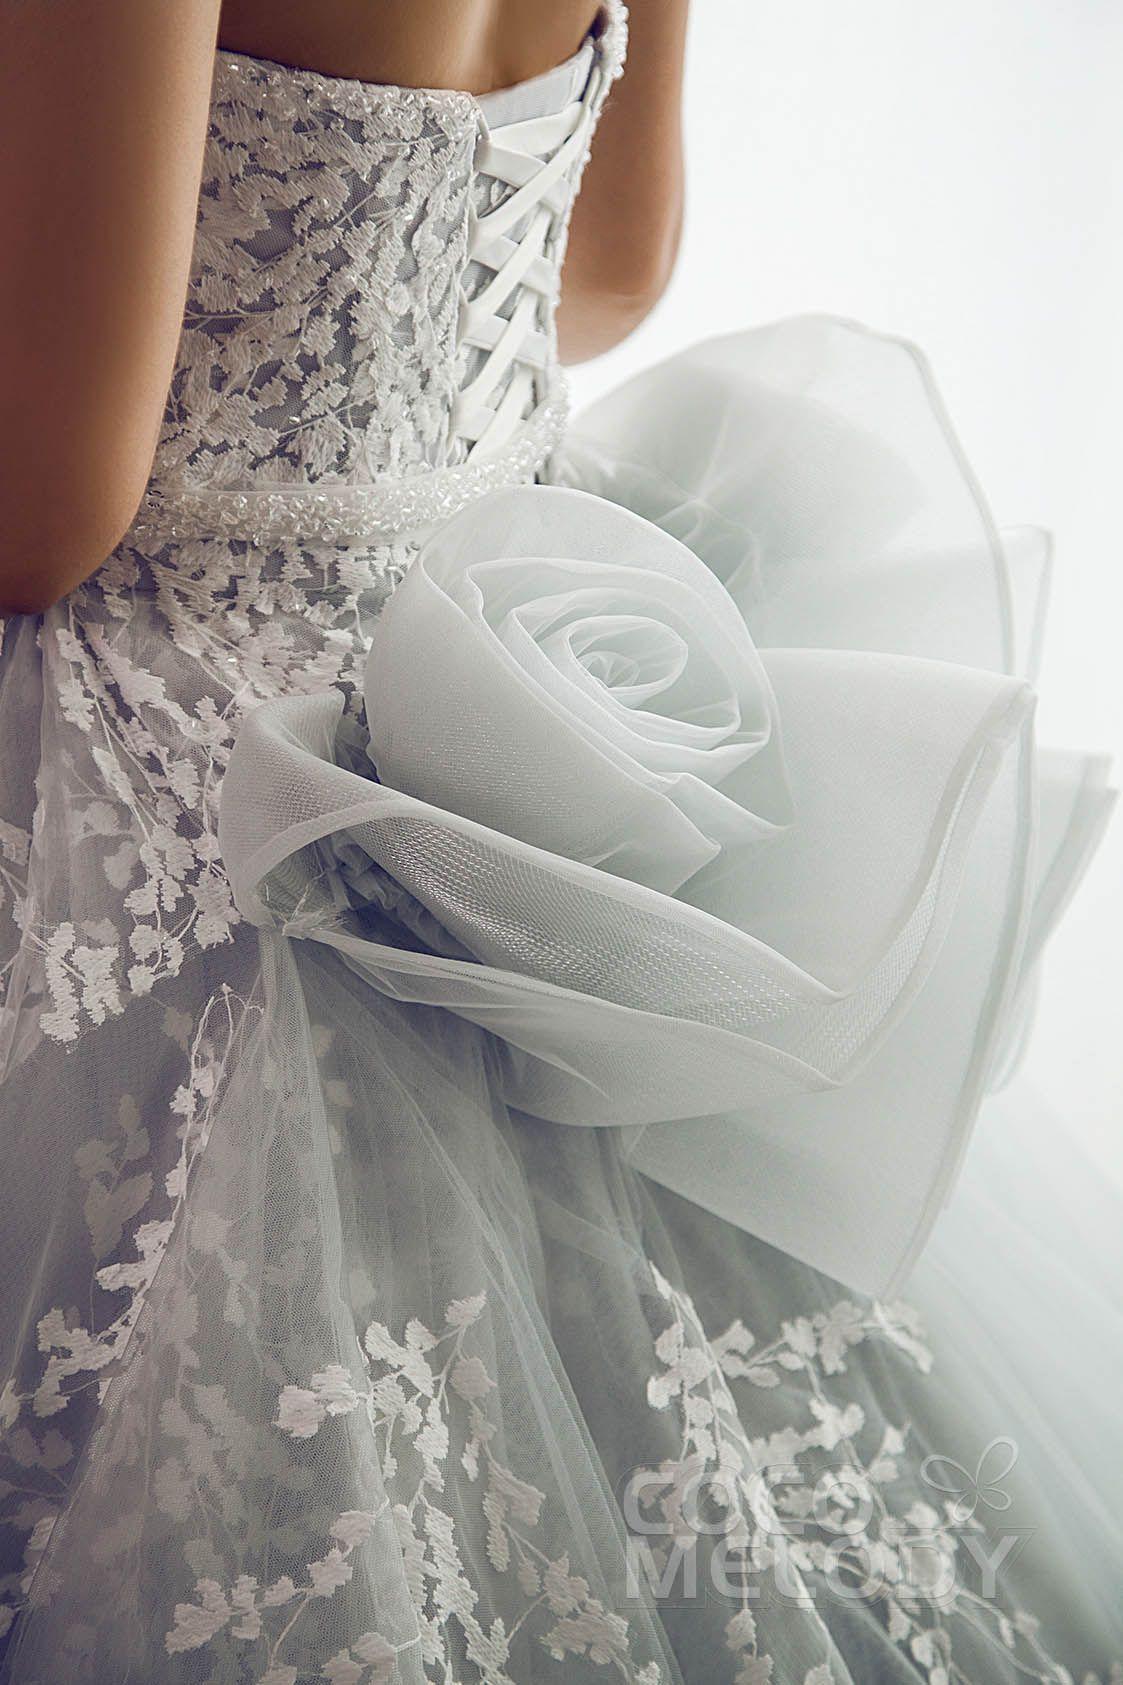 Usd 899 A Line Sweetheart Tulle Wedding Dress Beading Ld5054 Tulle Wedding Dress Wedding Dresses Beaded Wedding Dresses